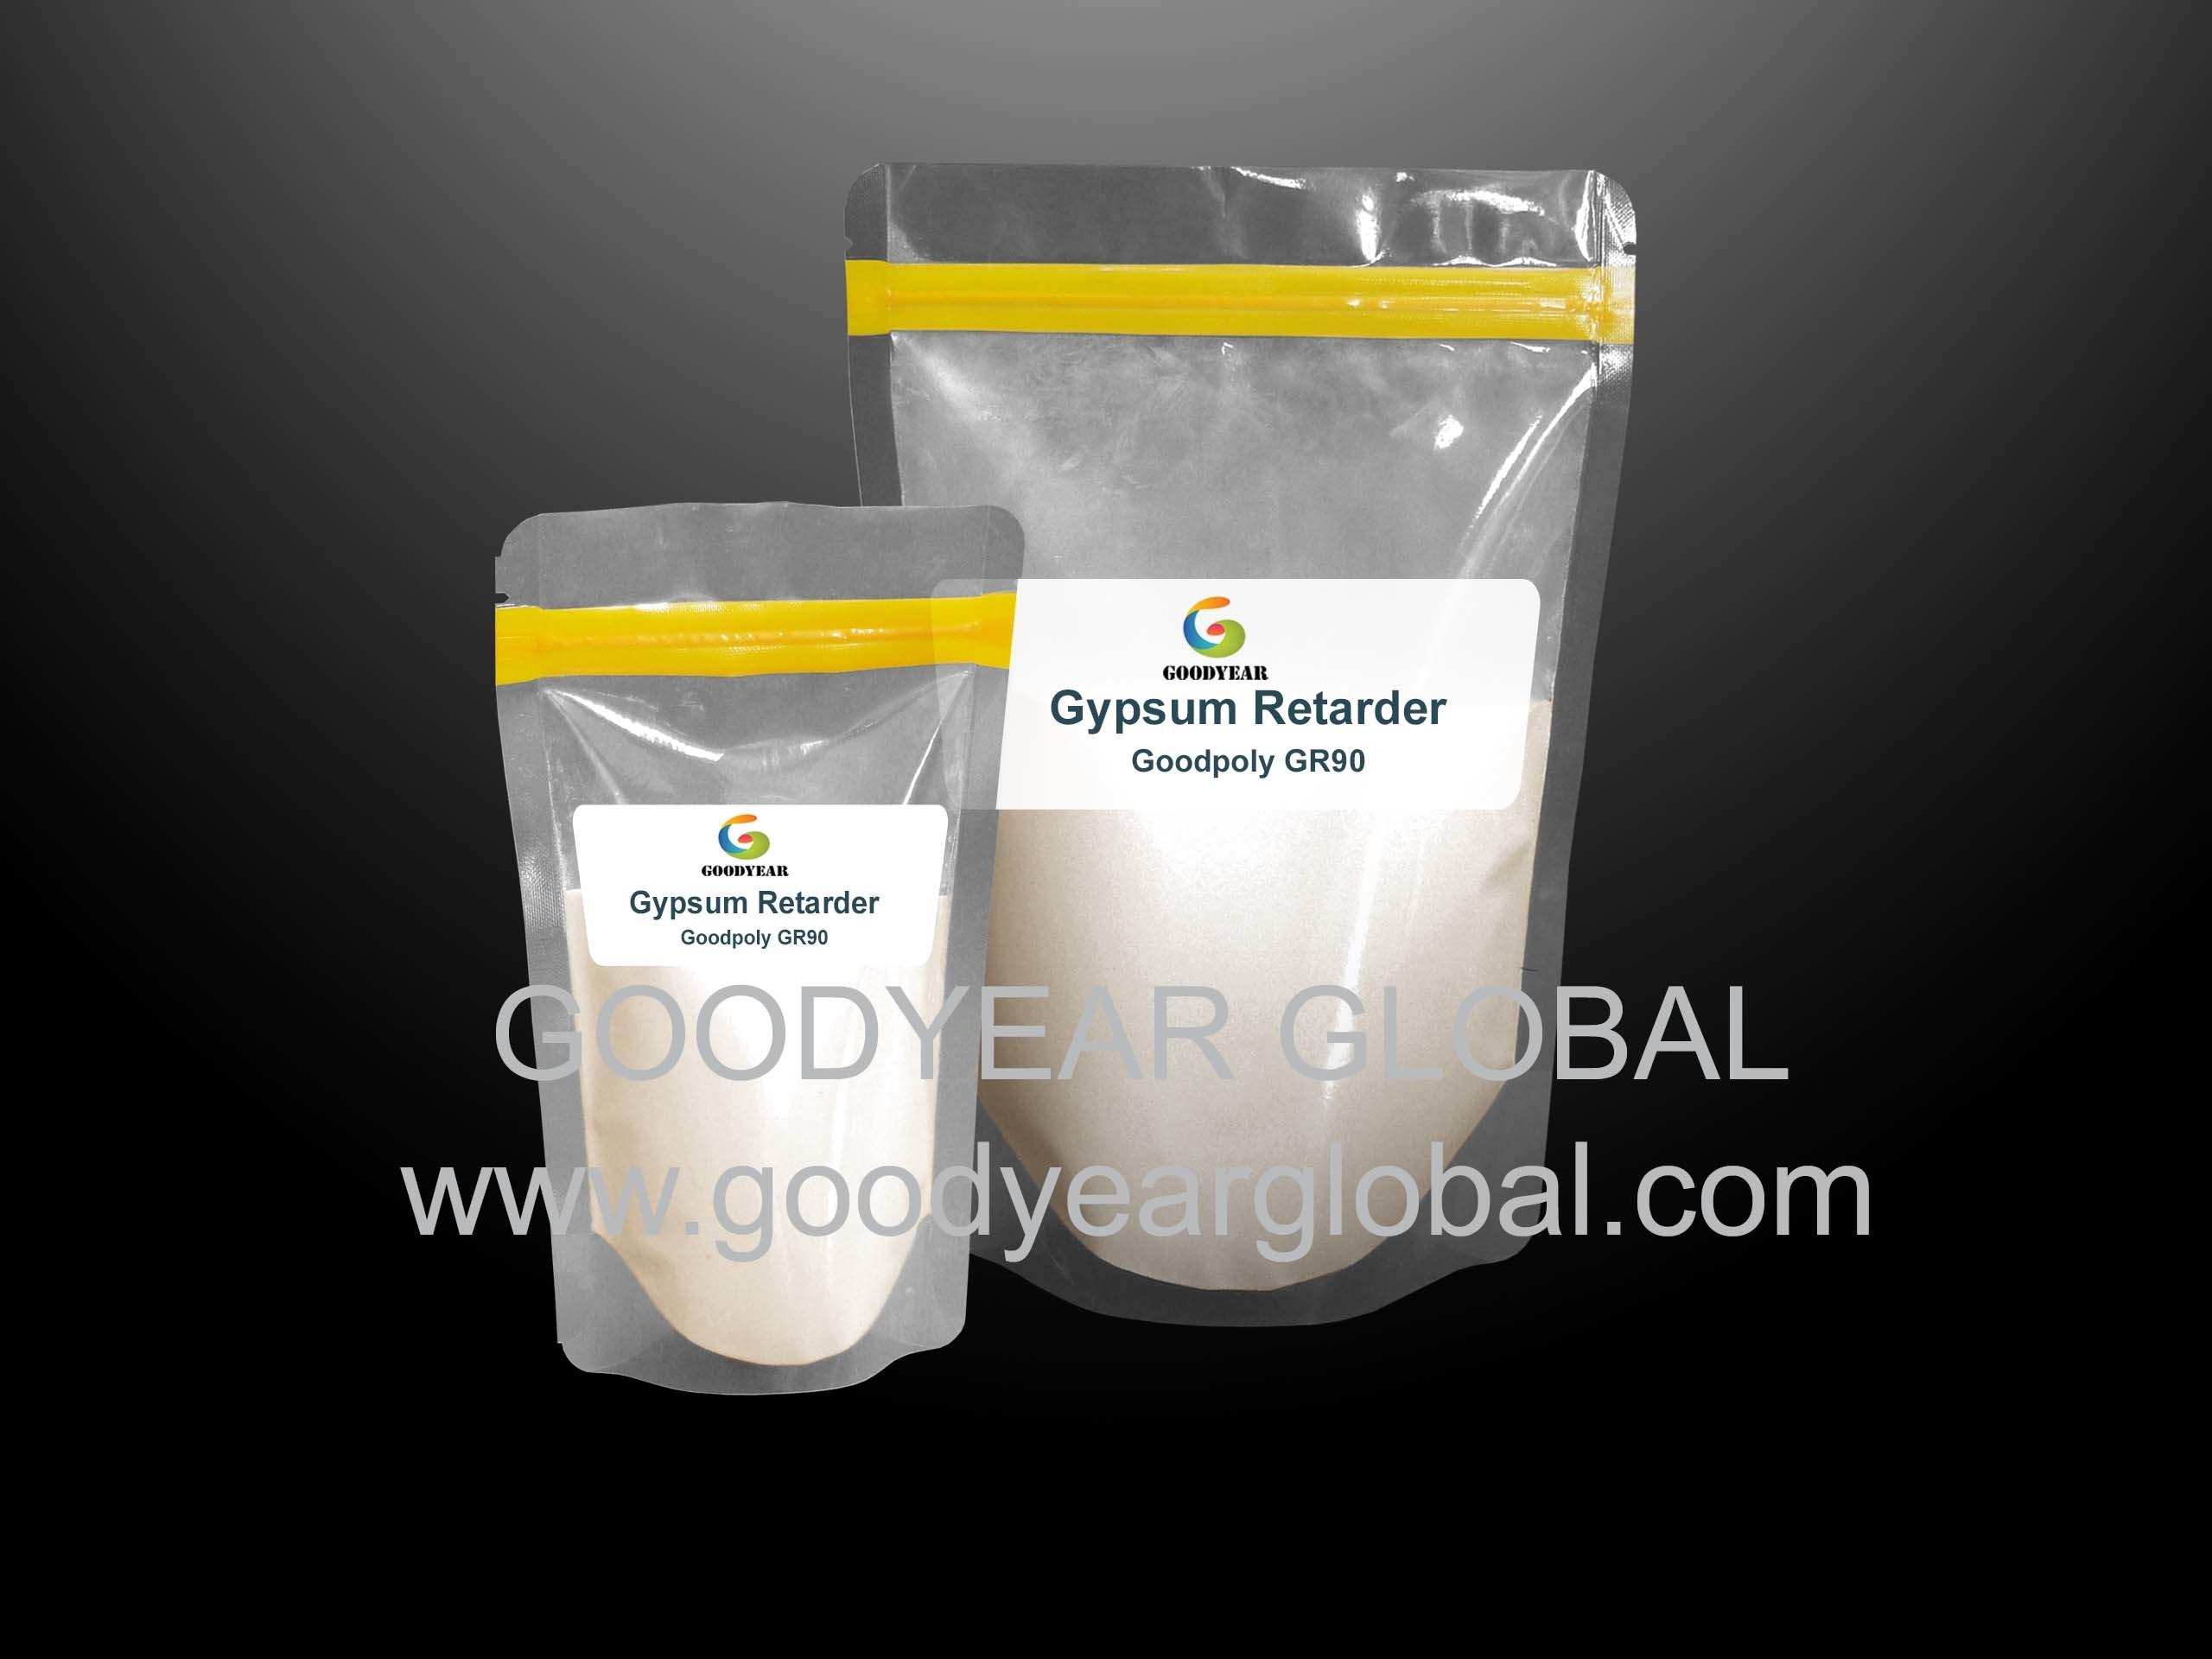 Gypsum Retarder-Goodpoly GR20